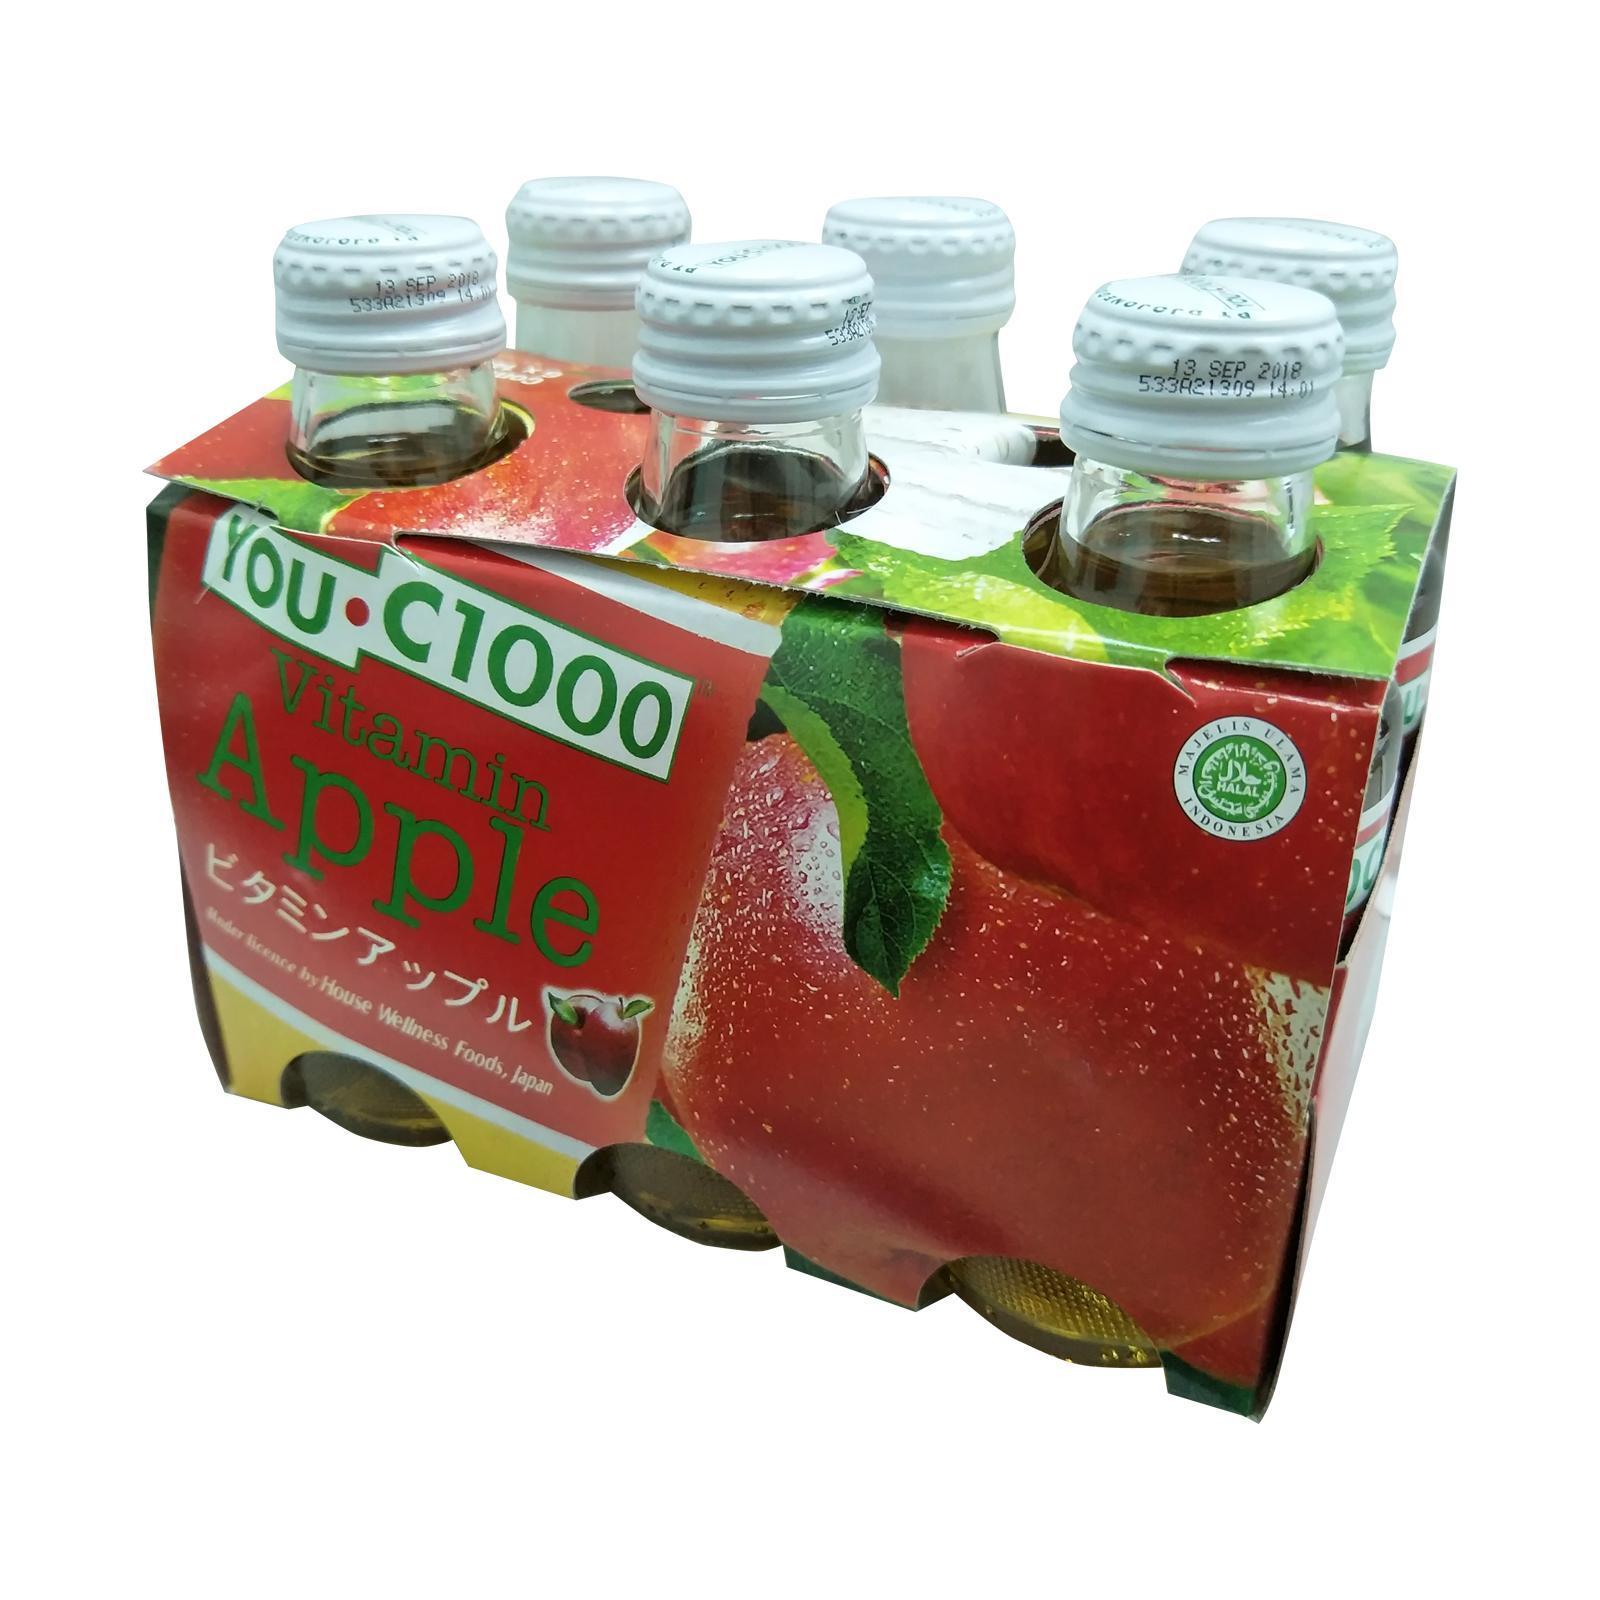 YOUC1000 Vitamin Apple Health Drink